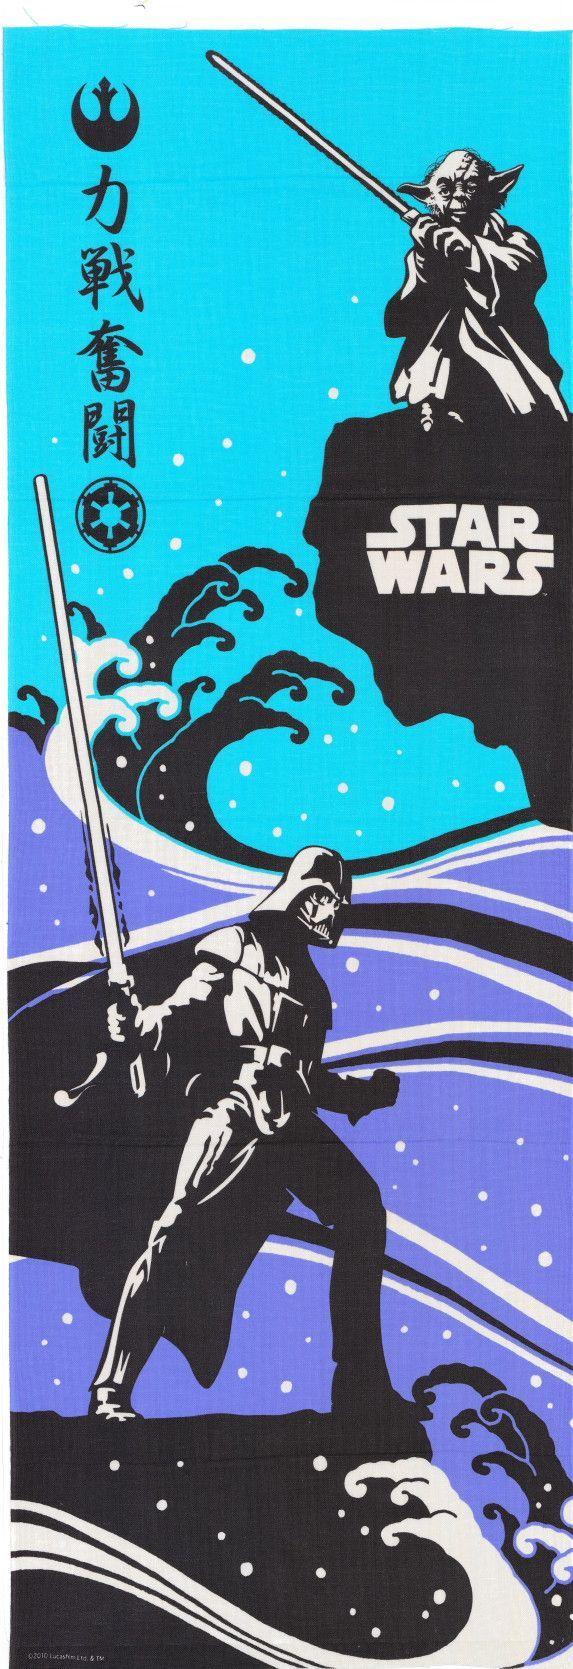 Darth and Yoda Star Wars Tenugui